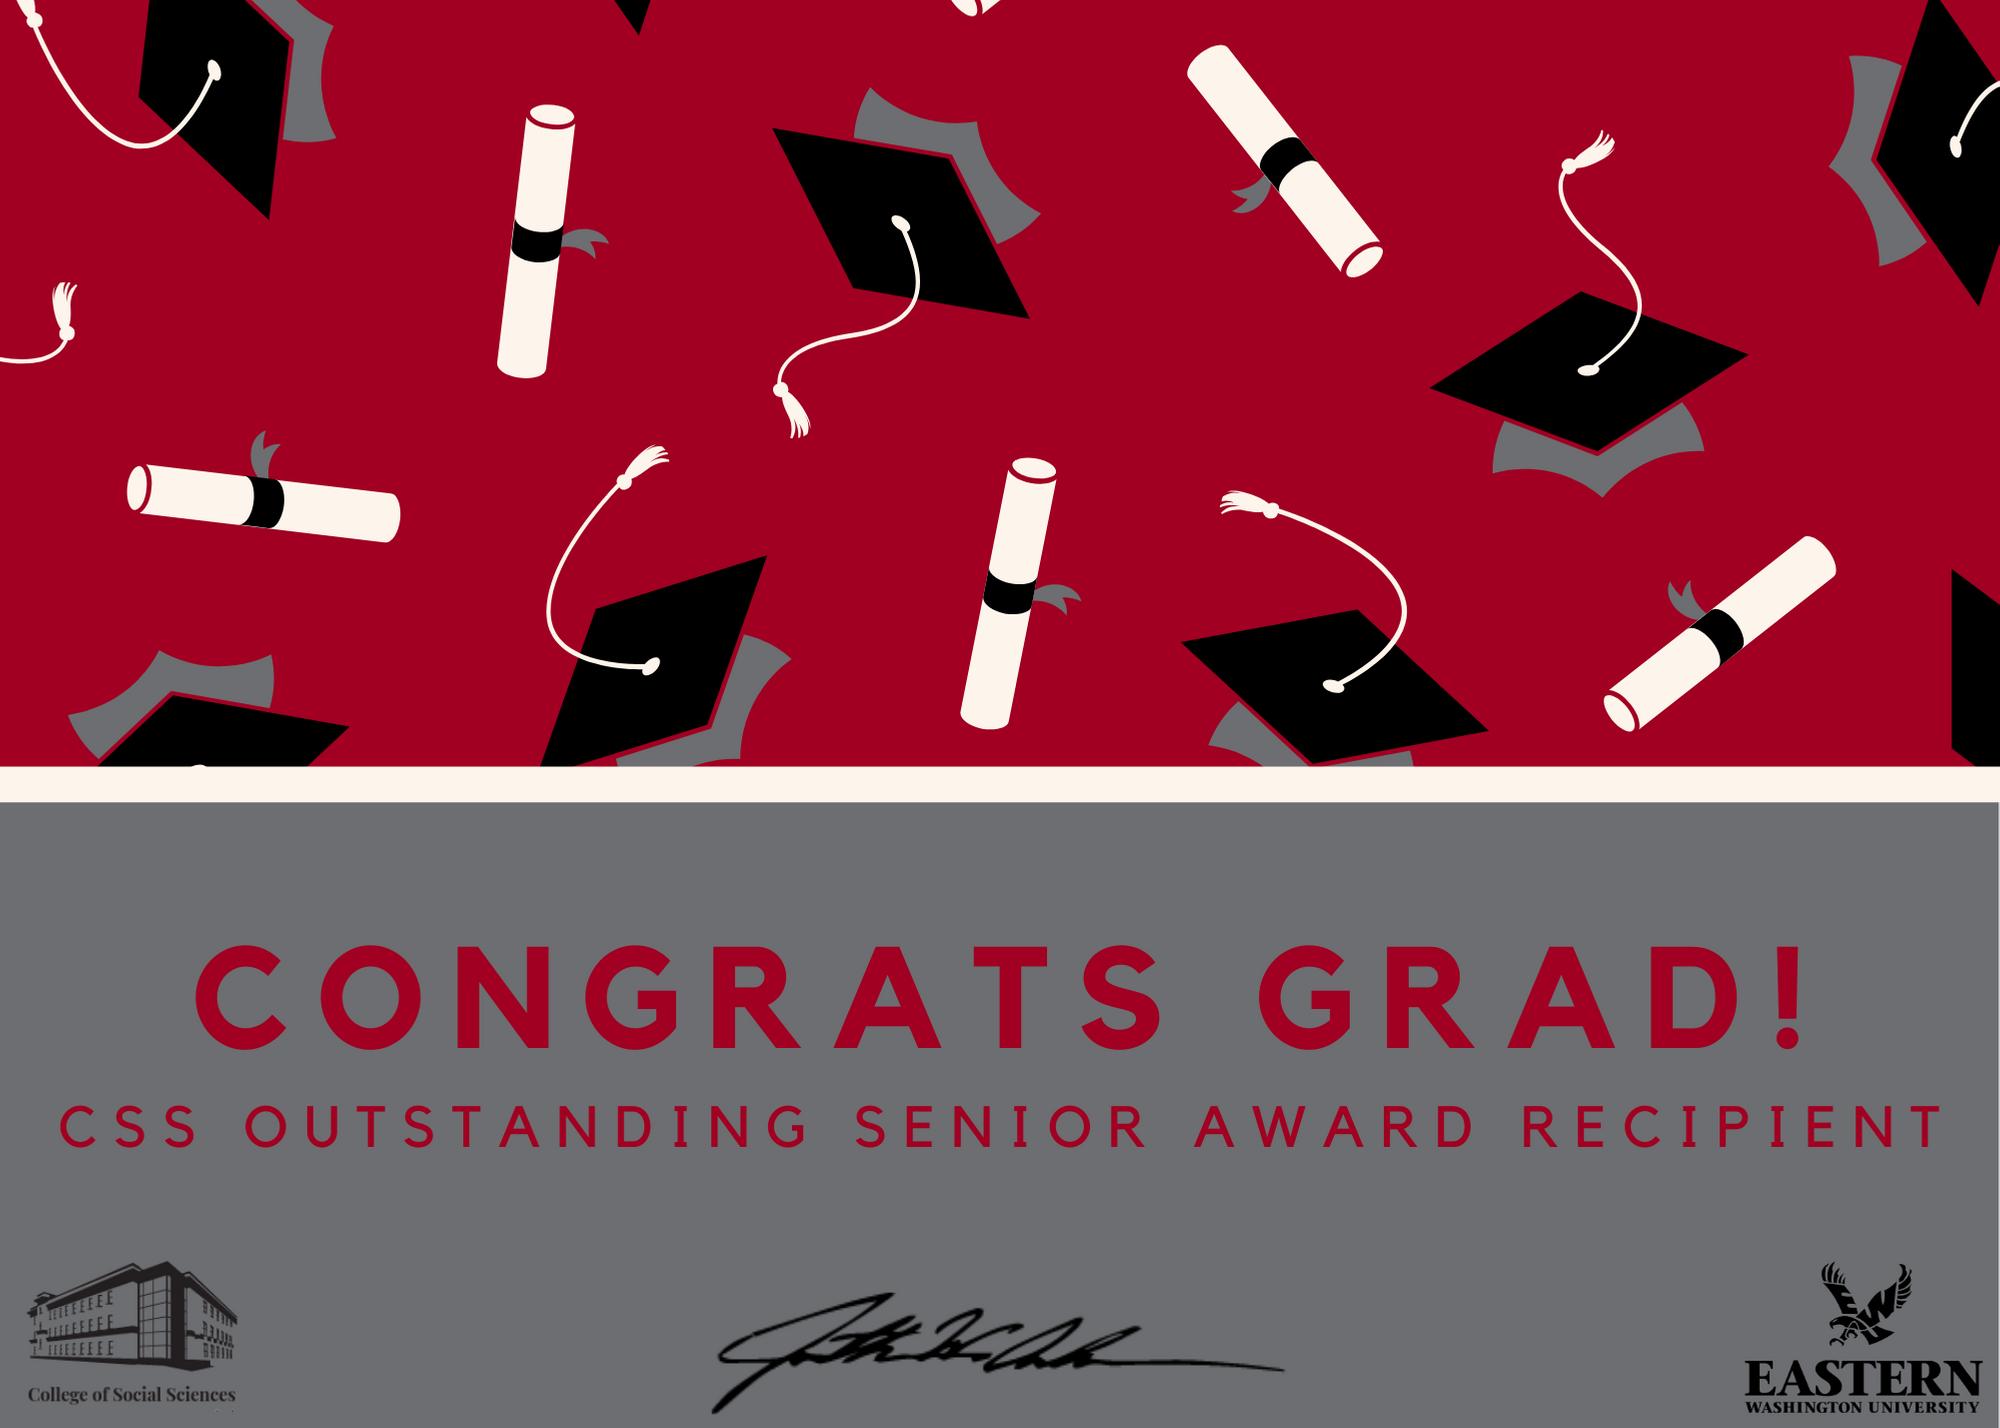 4152-caps-and-diplomas-pattern-graduation-card-2.png